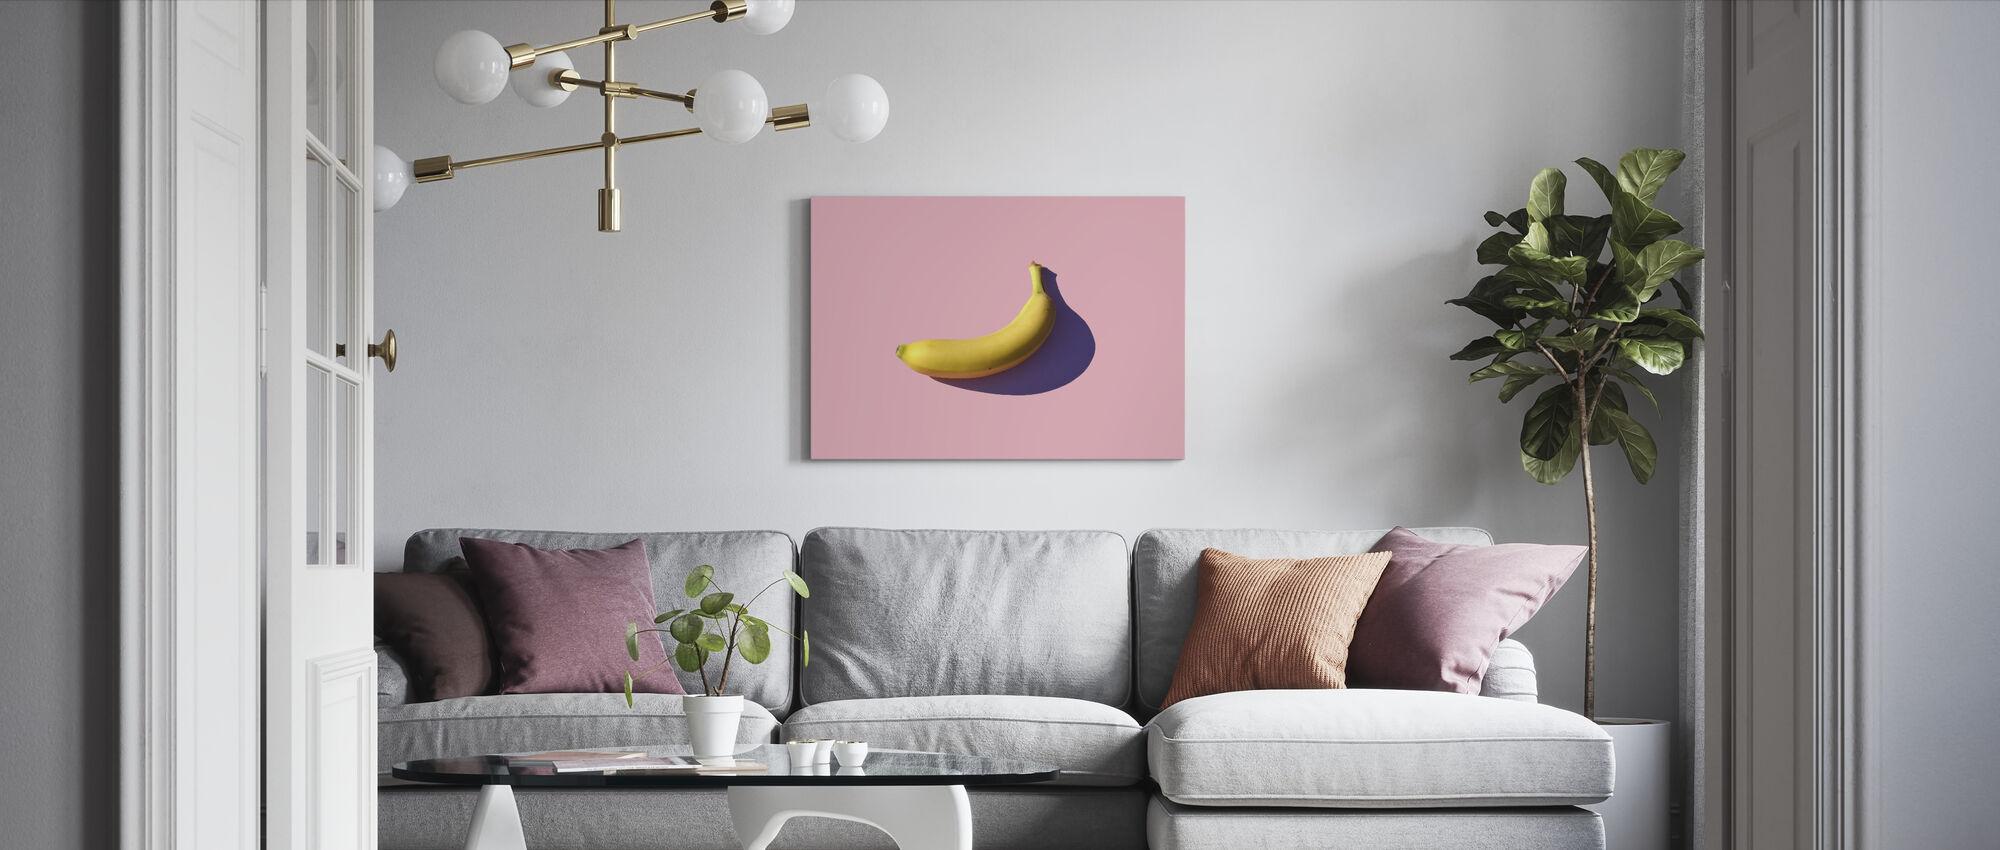 Banane - Leinwandbild - Wohnzimmer